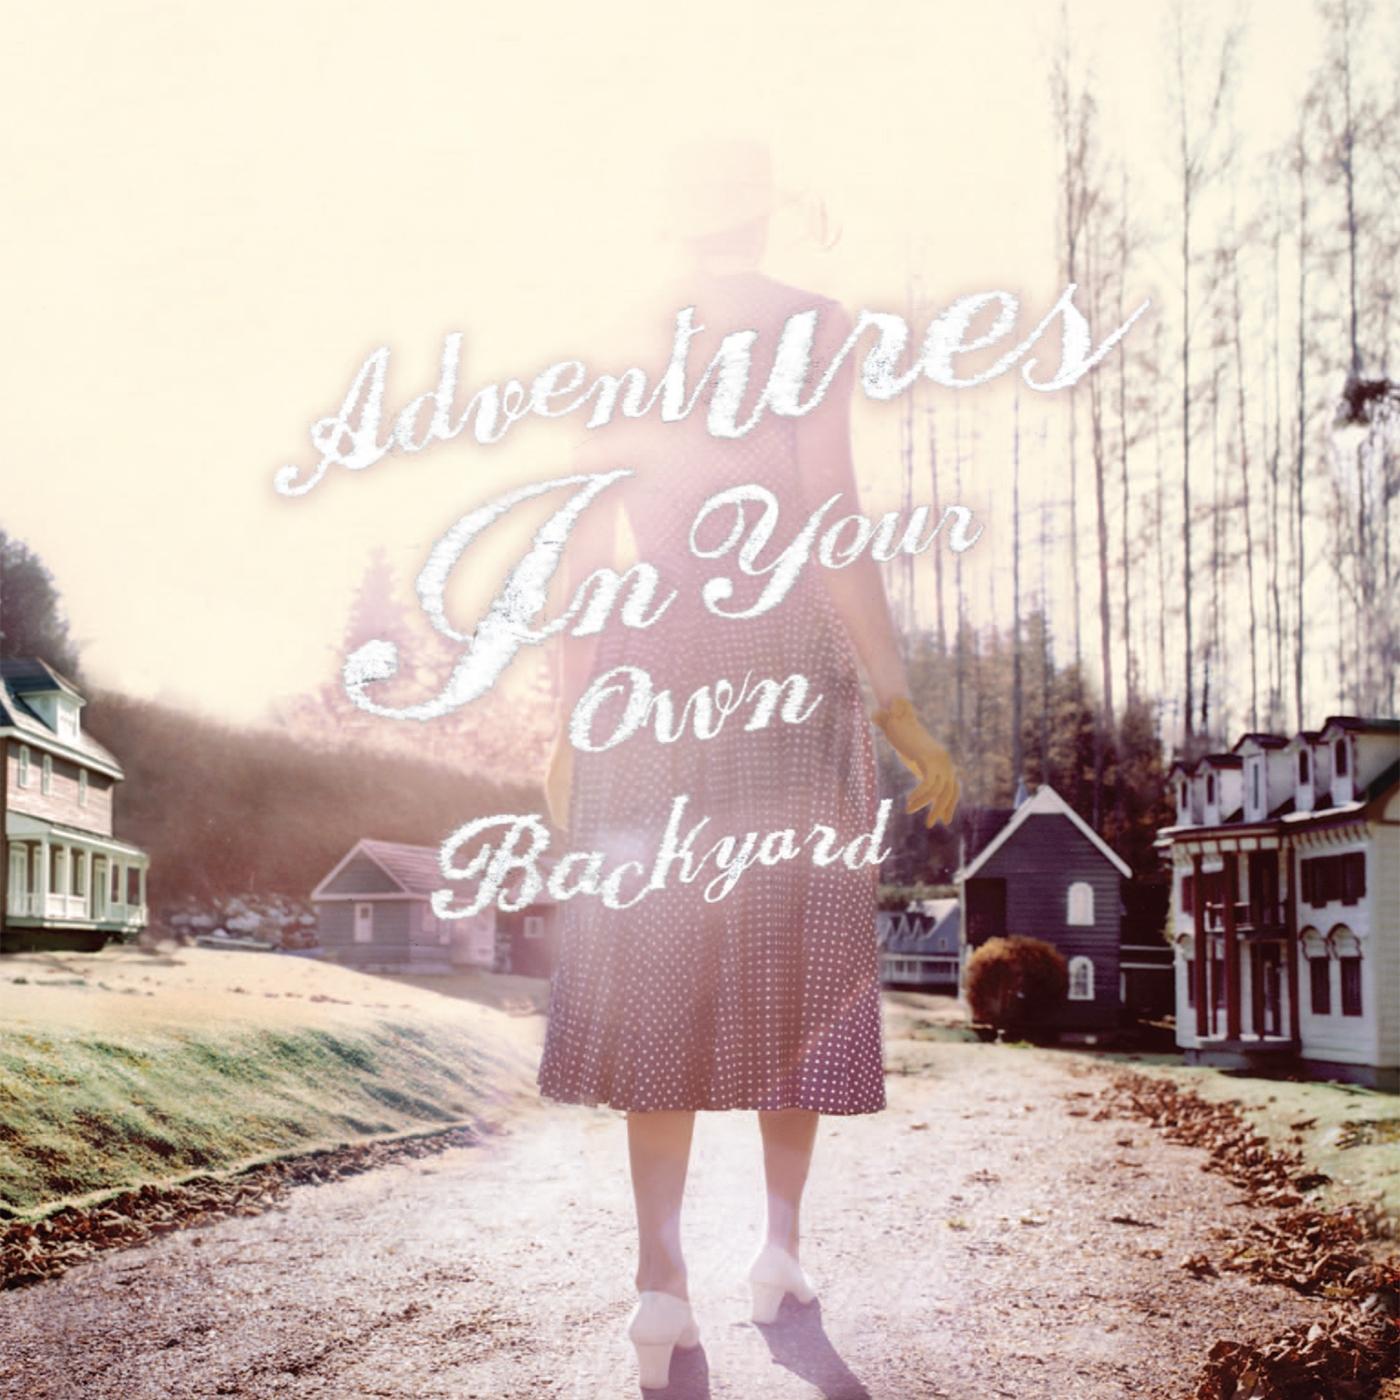 Patrick watson adventures in your own backyard 11